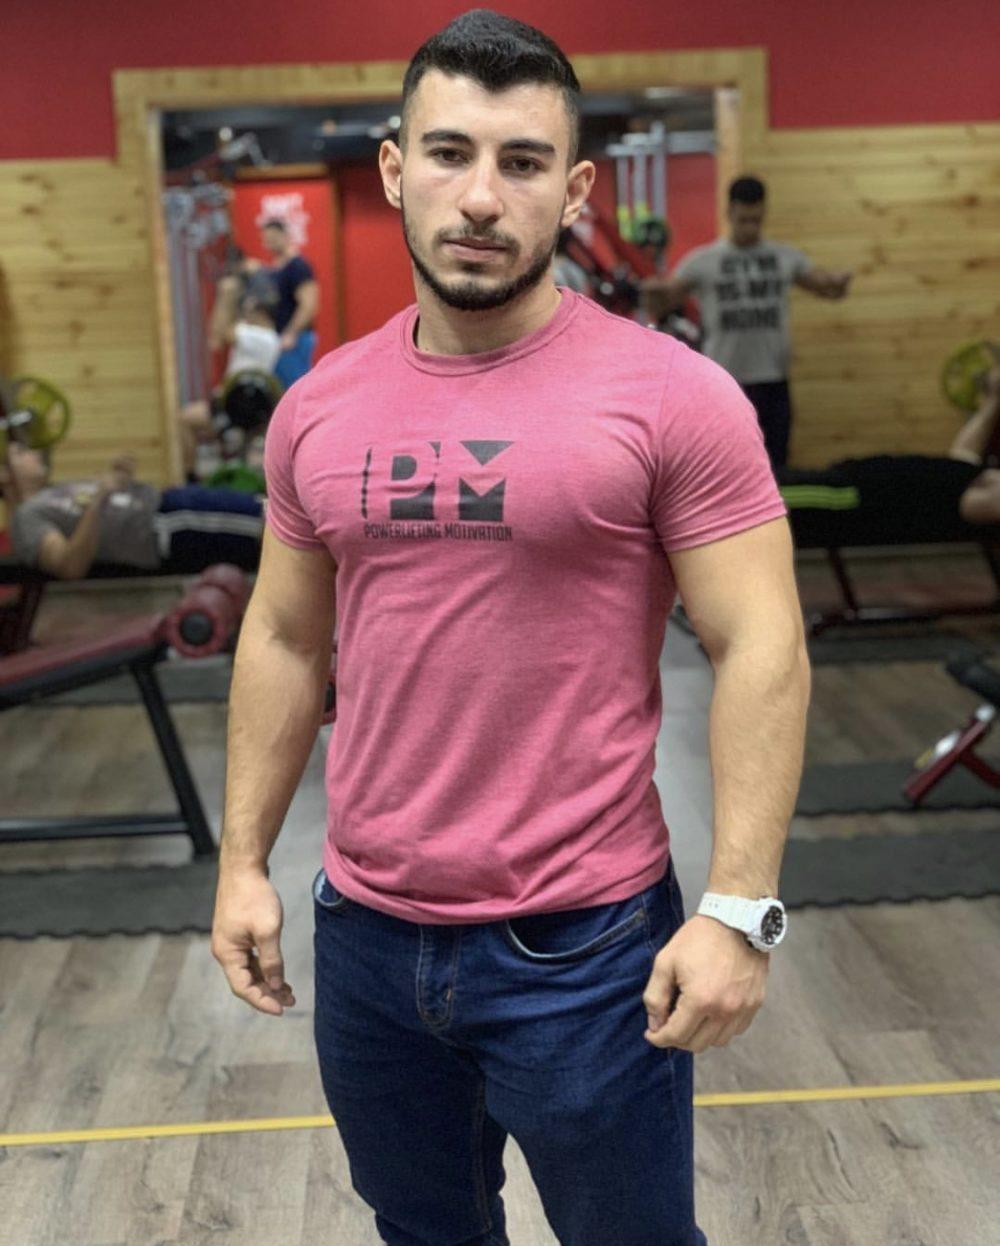 PM pink me t-shirt